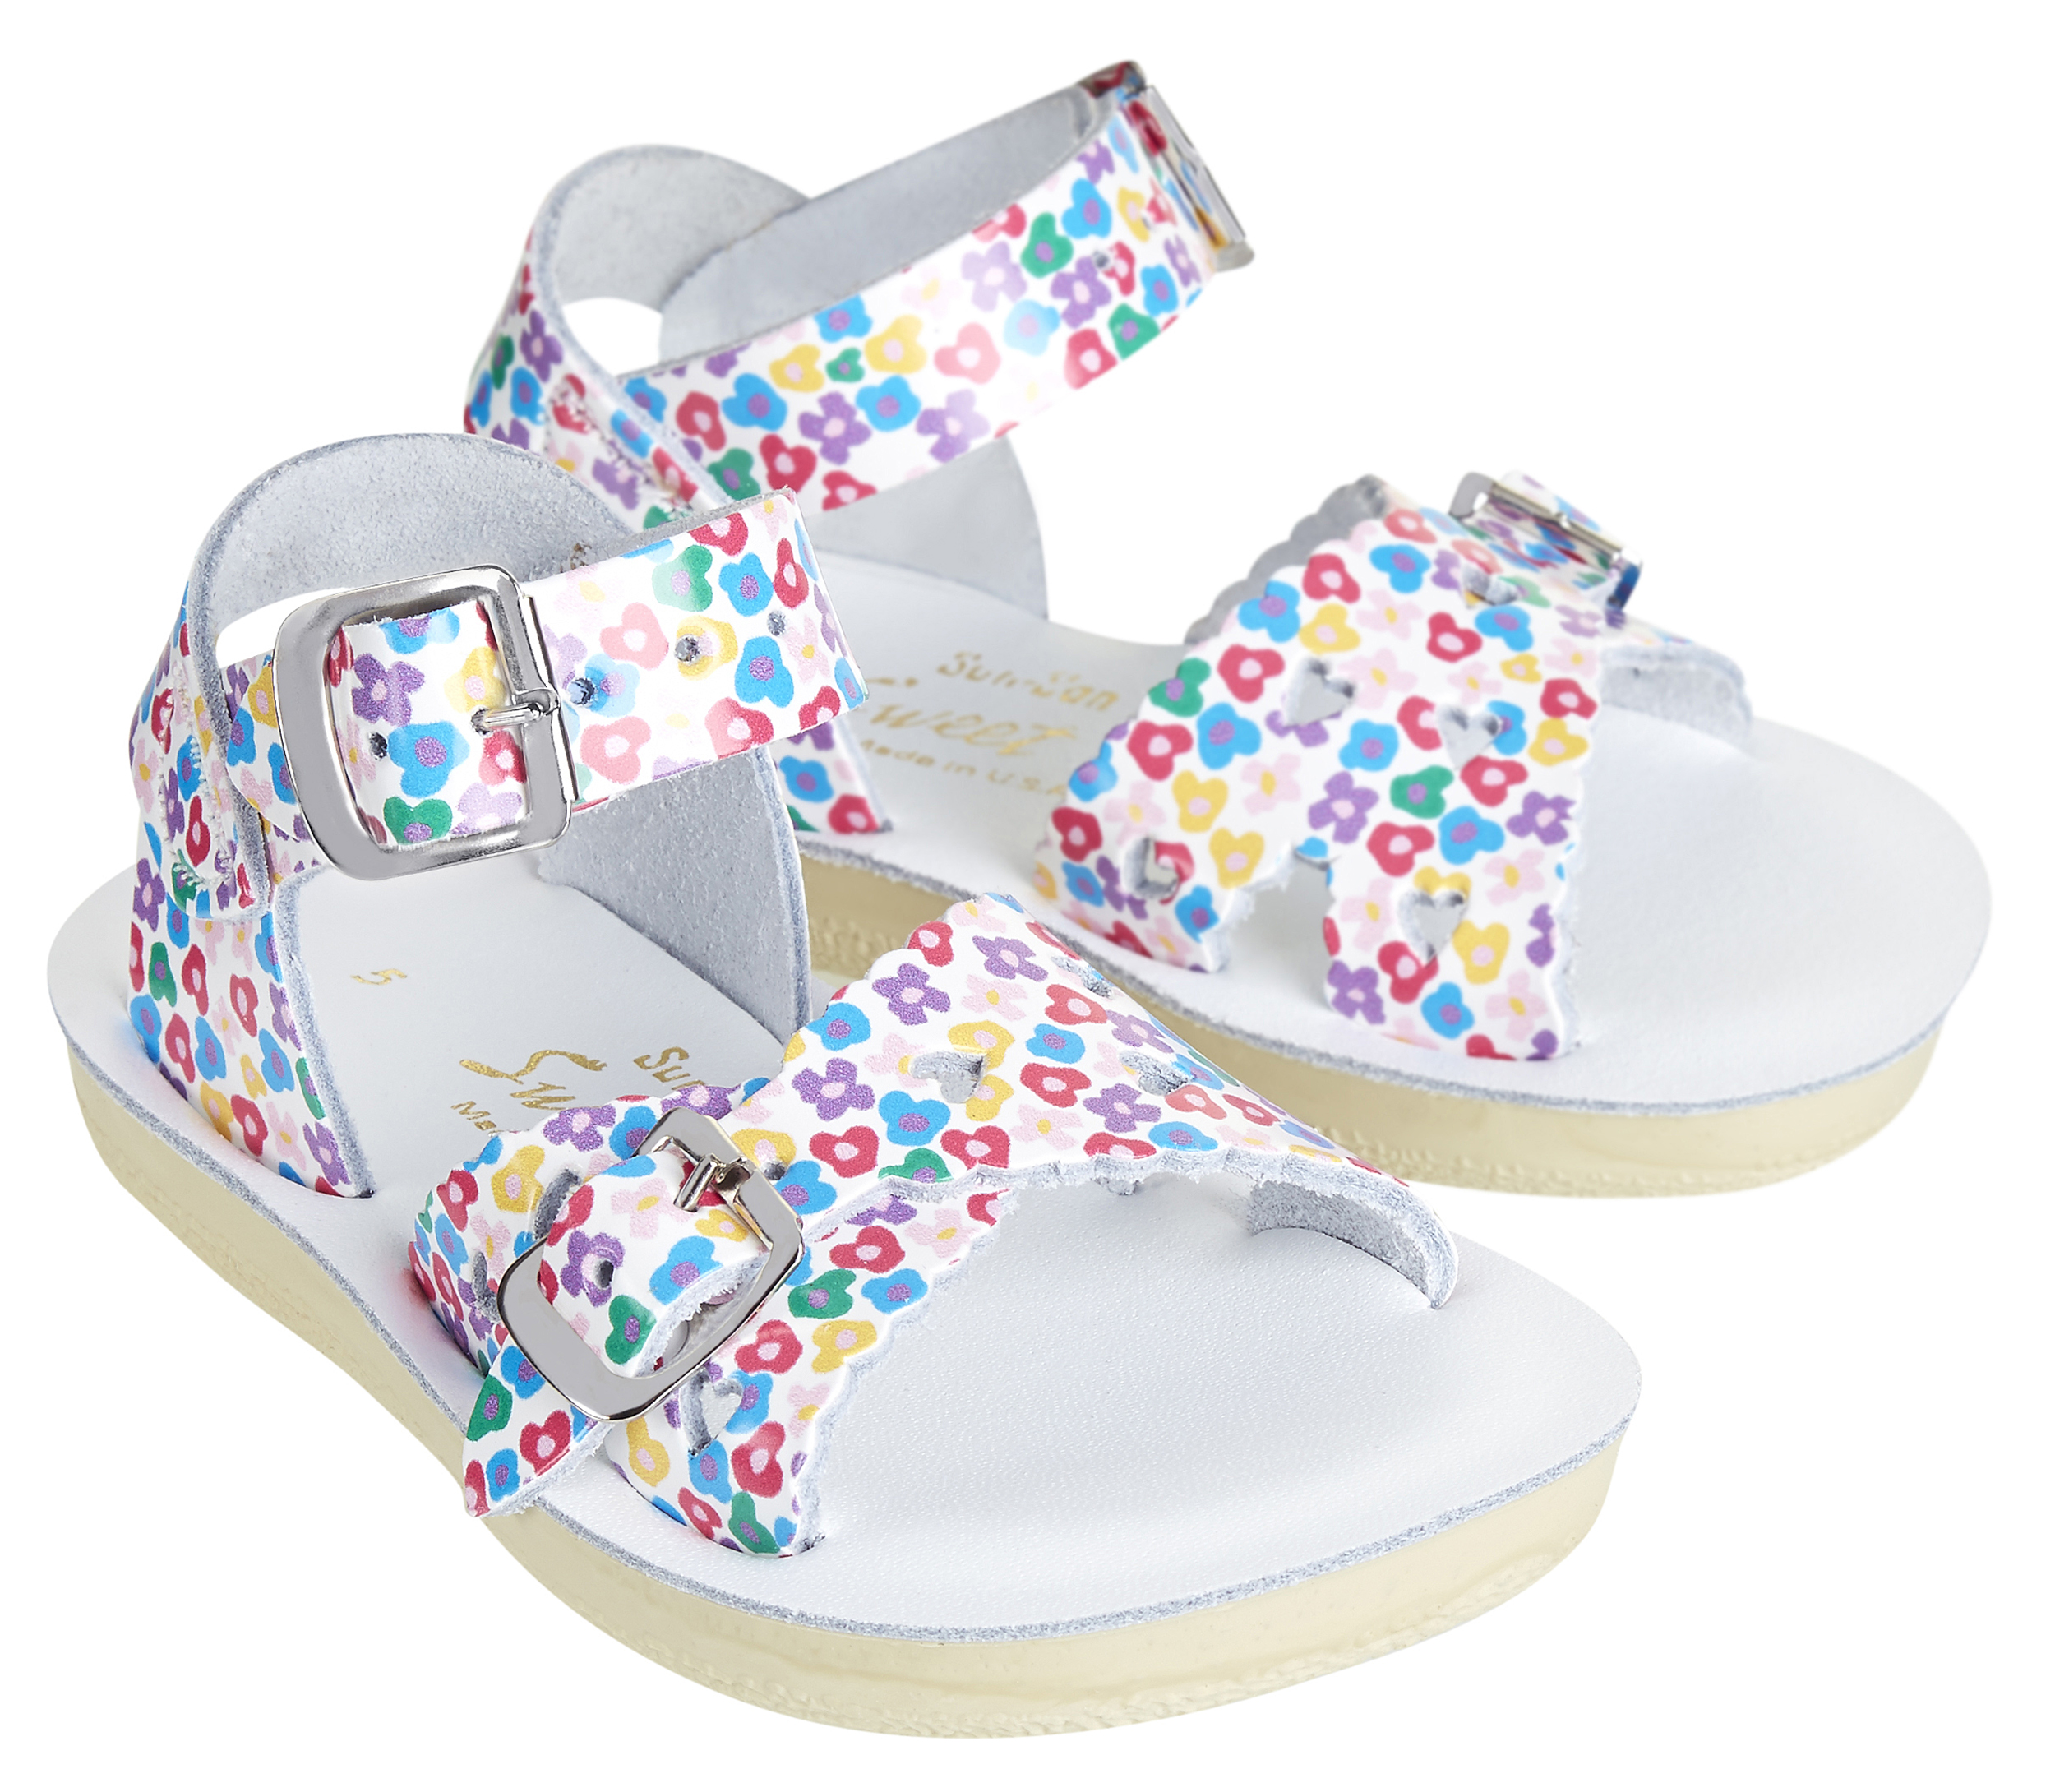 Saltwater floral kids sandals